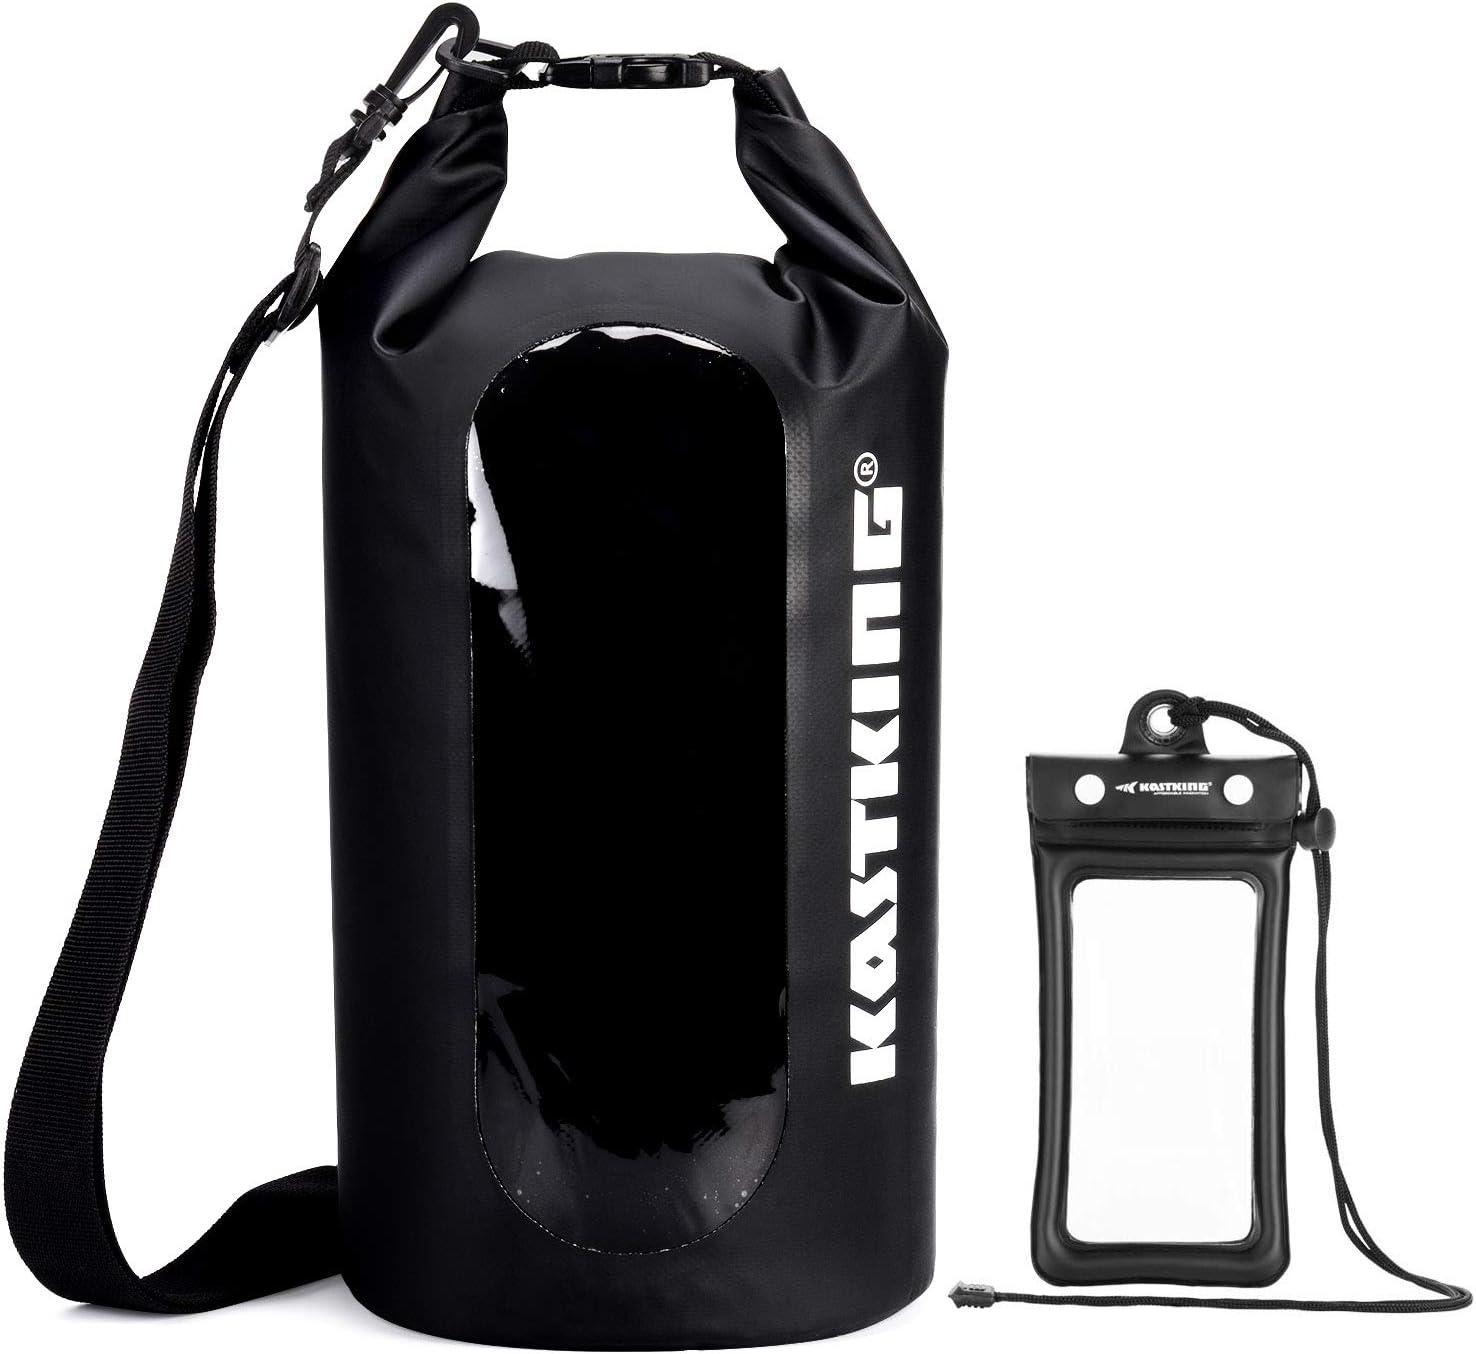 13 Ltr LIGHTWEIGHT DRY SACK Black waterproof bag trek pouch Sailing roll /& clip